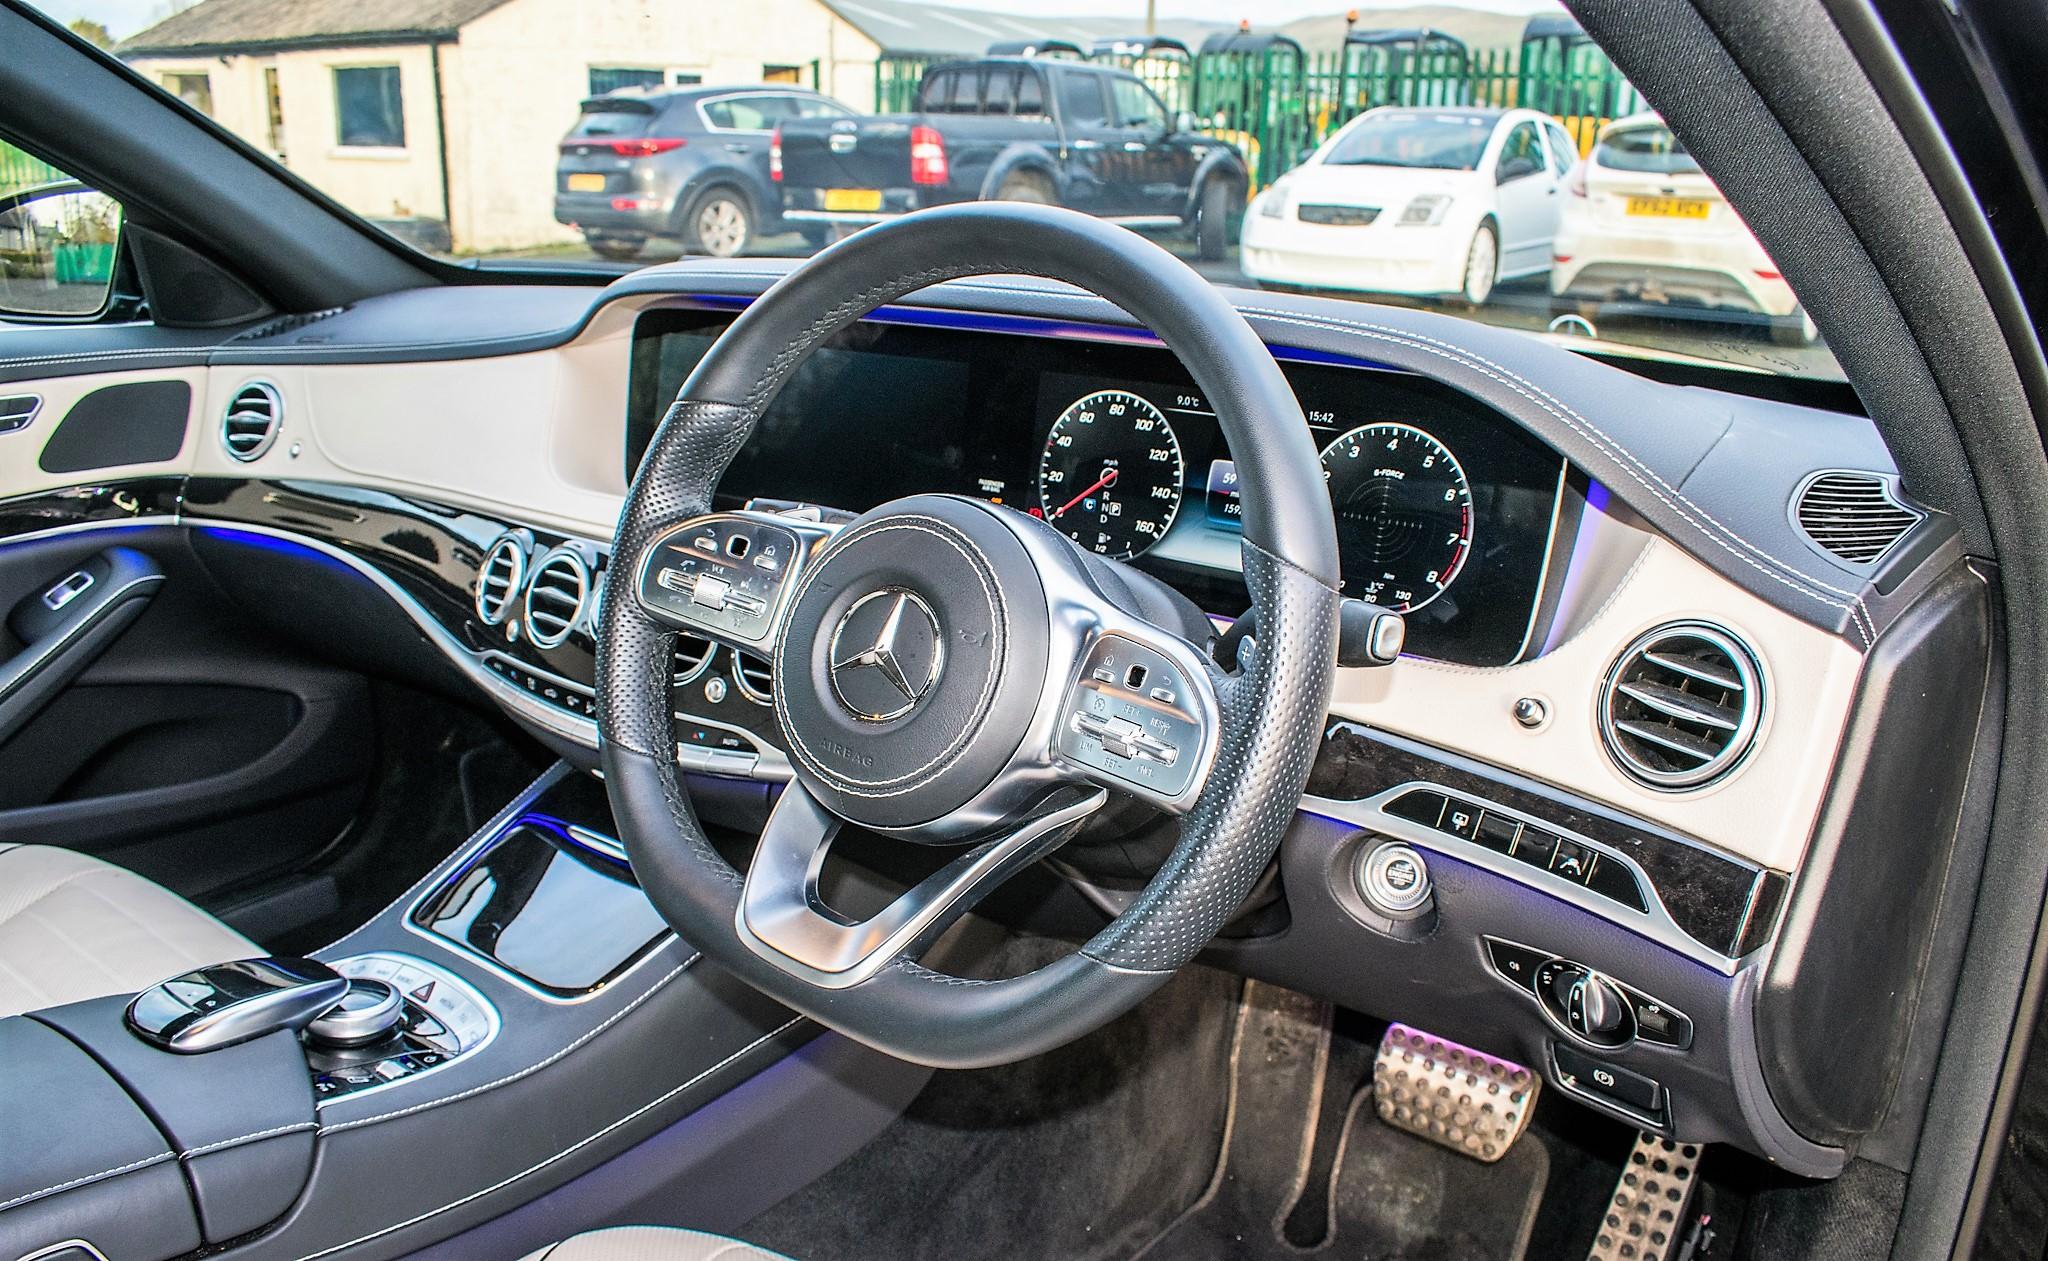 Mercedes Benz S450 L AMG Line Executive auto petrol 4 door saloon car Registration Number: FX68 - Image 24 of 33